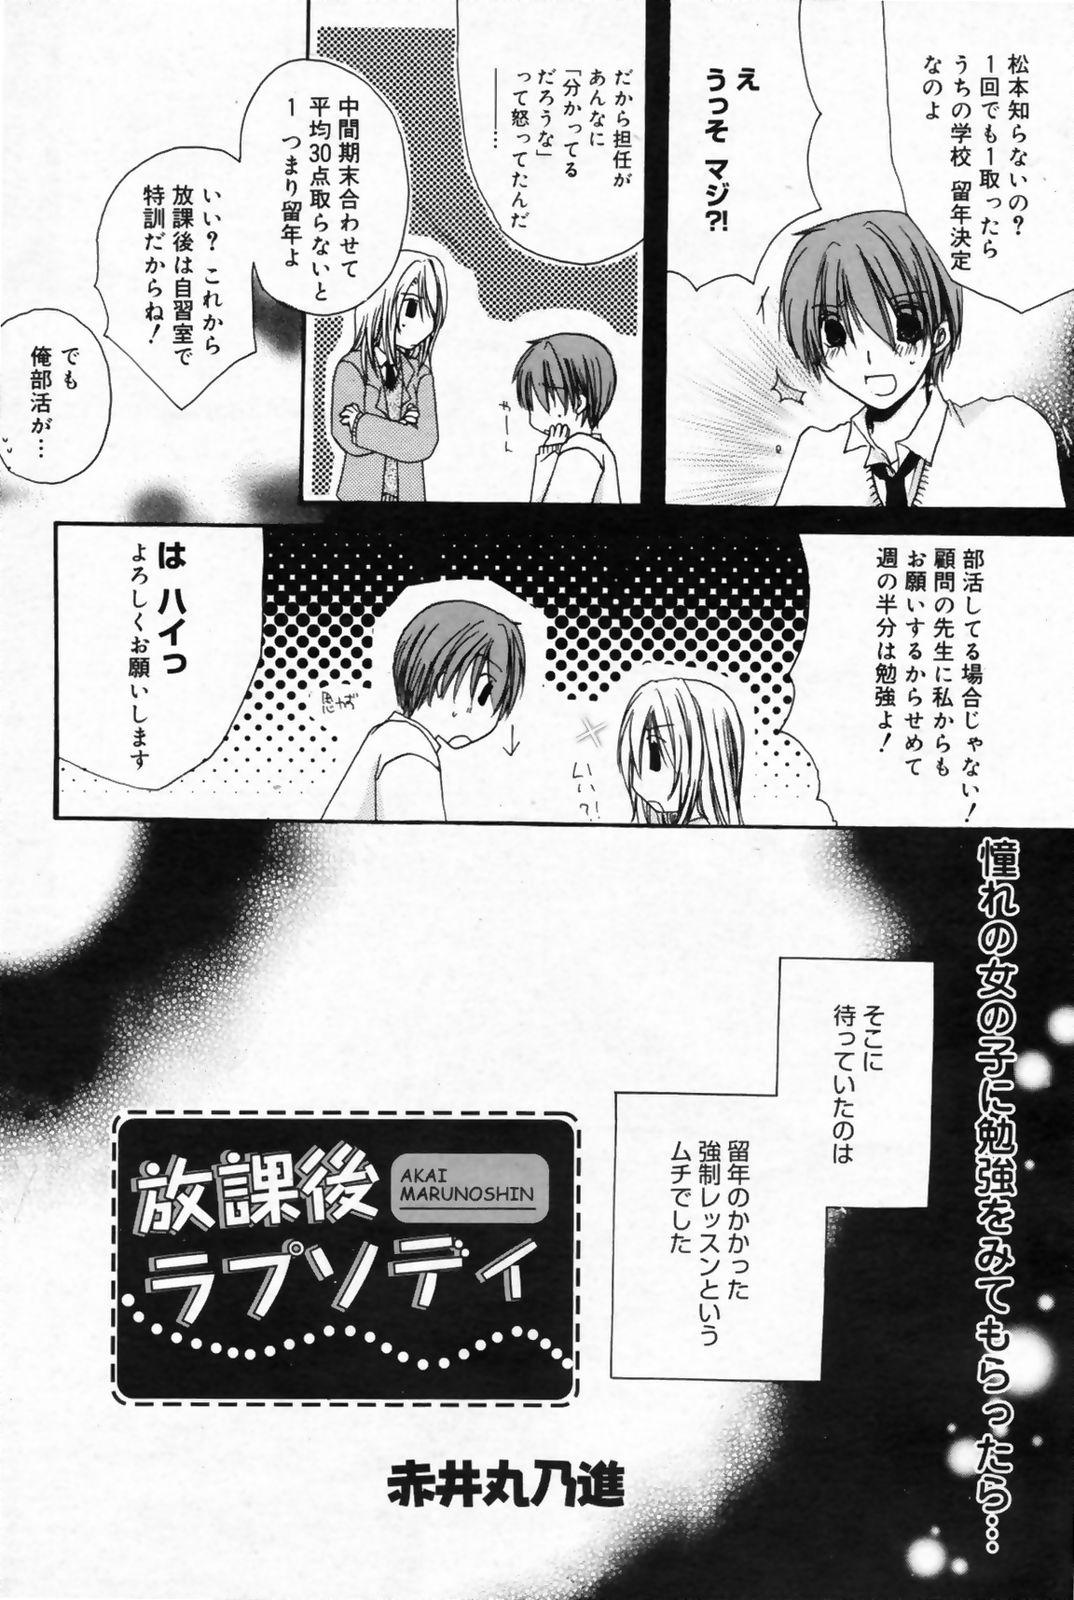 Manga Bangaichi 2009-02 Vol. 234 101